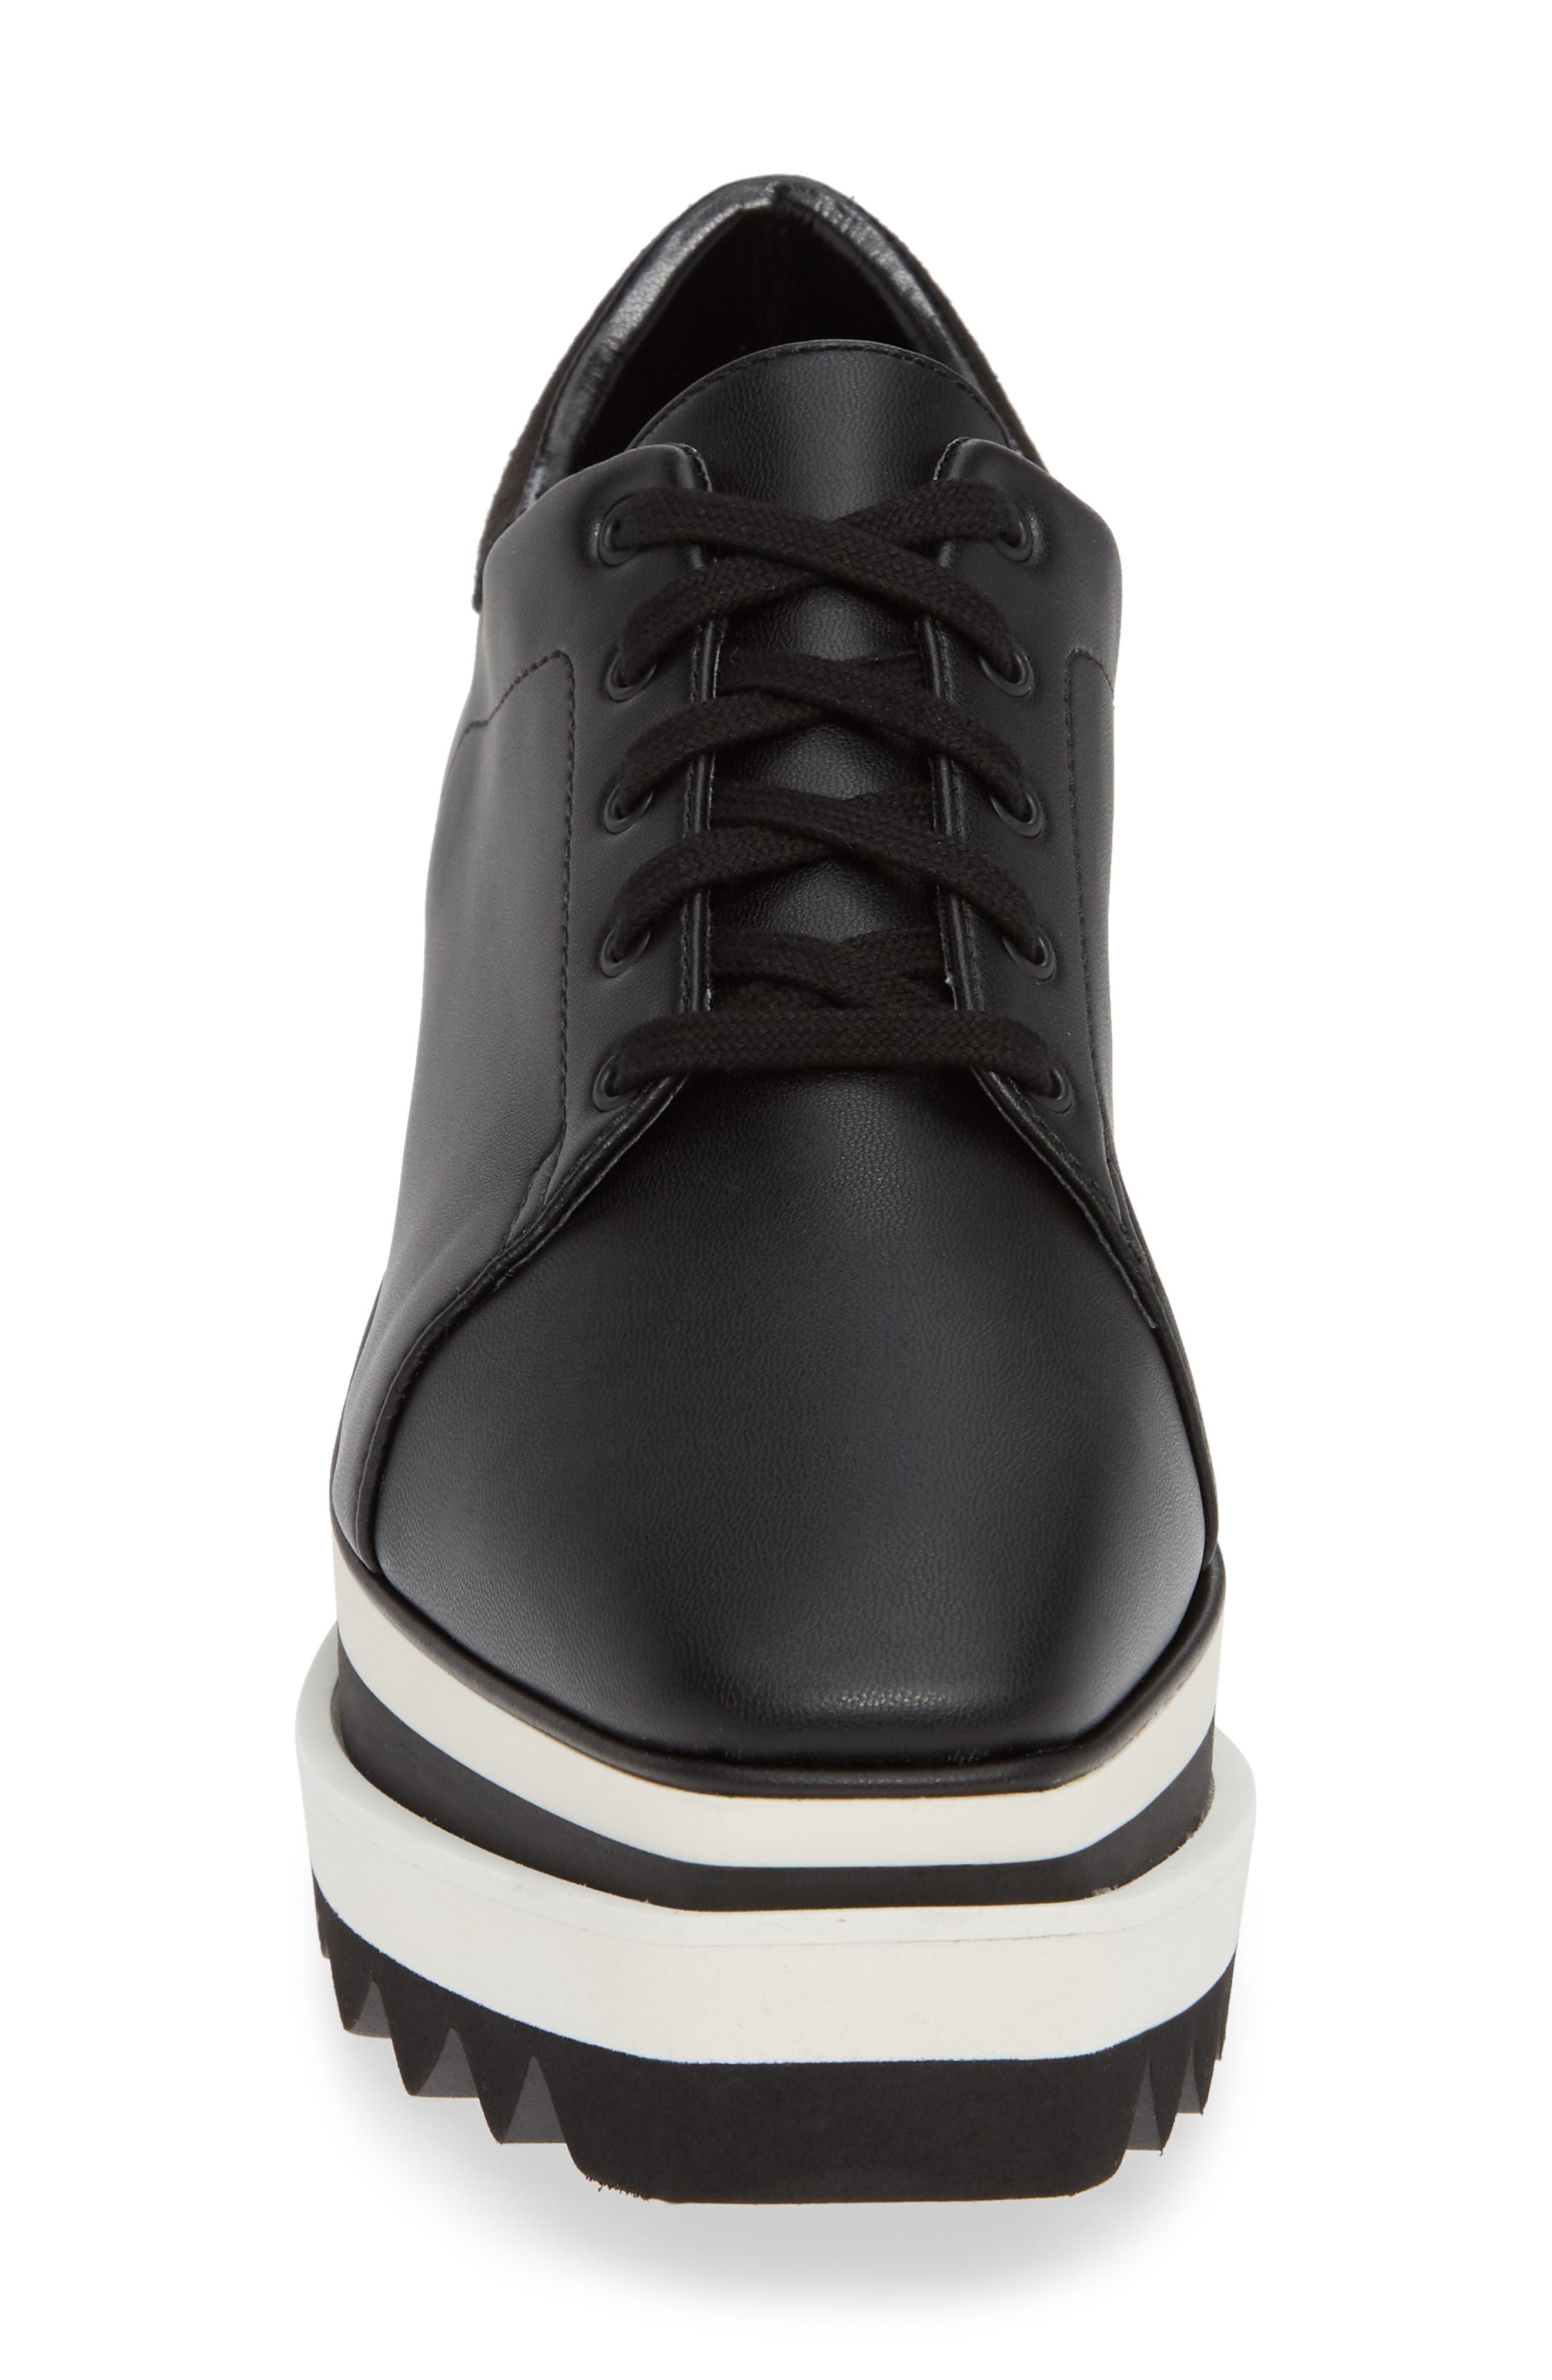 Sneak-Elyse Flatform Sneaker,                             Alternate thumbnail 4, color,                             BLACK